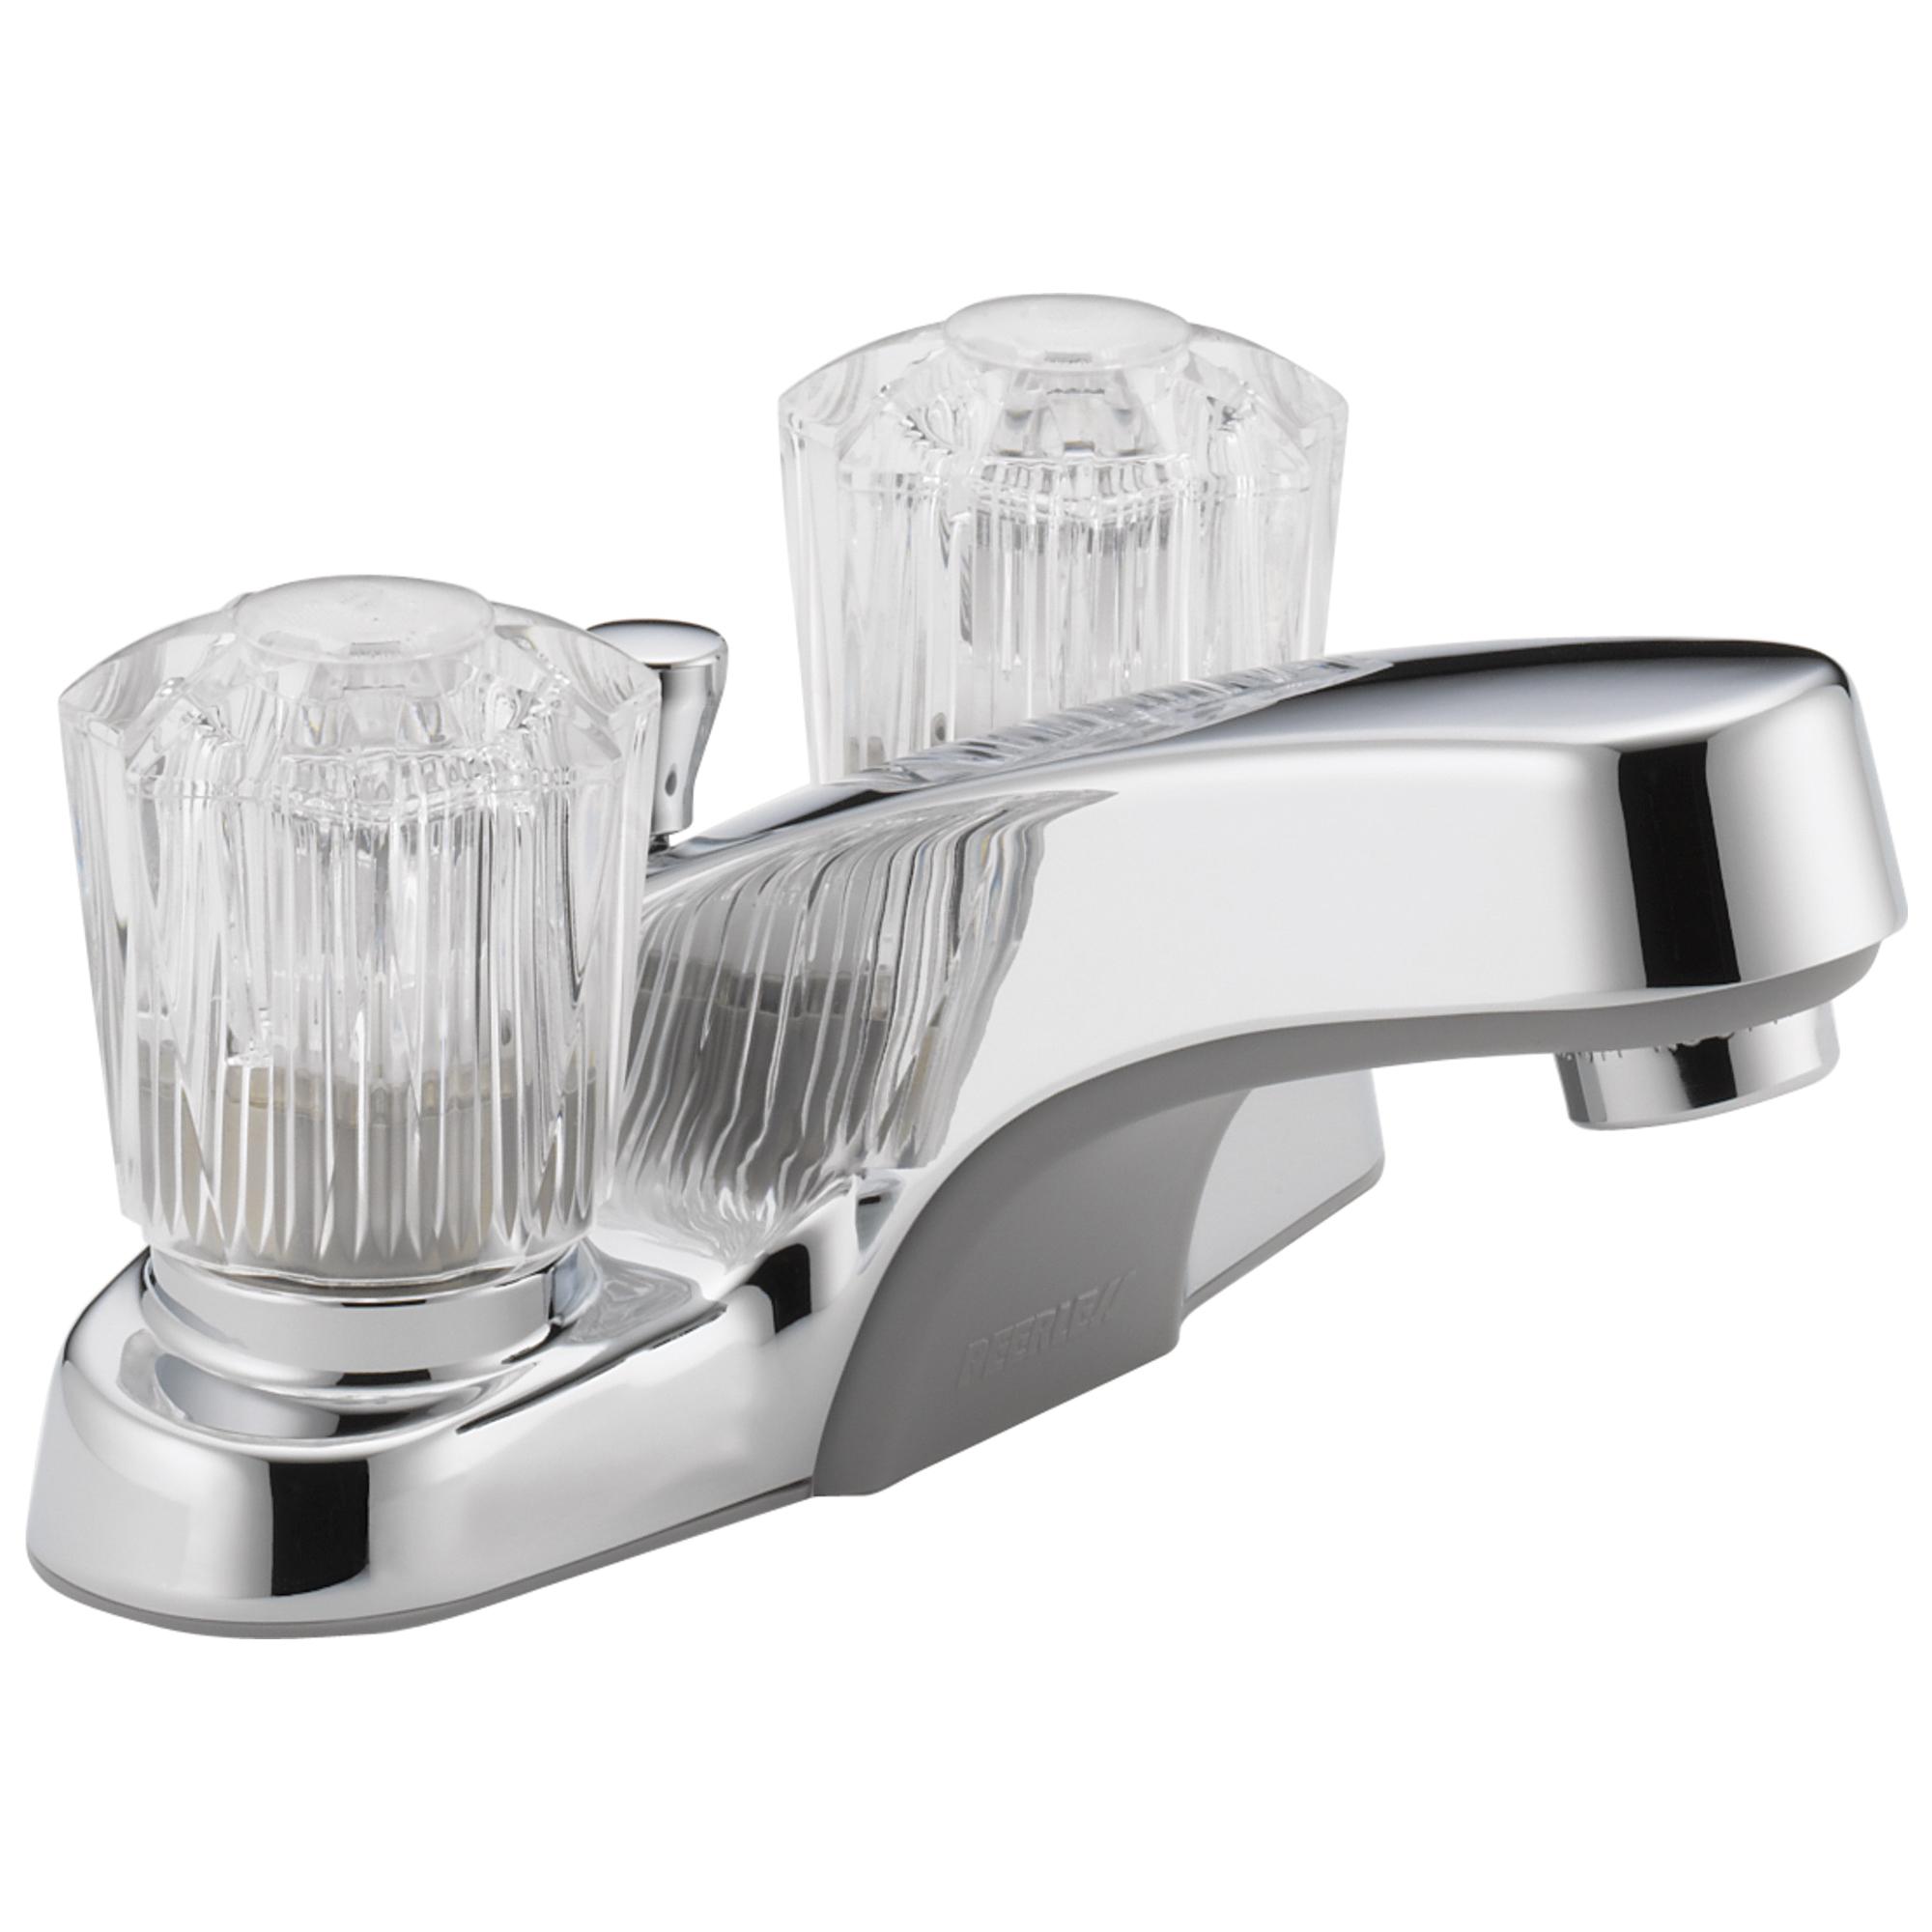 Peerless® P245LF Centerset Lavatory Faucet, Apex, Chrome Plated, 2 Handles, Plastic Pop-Up Drain, 1.2 gpm